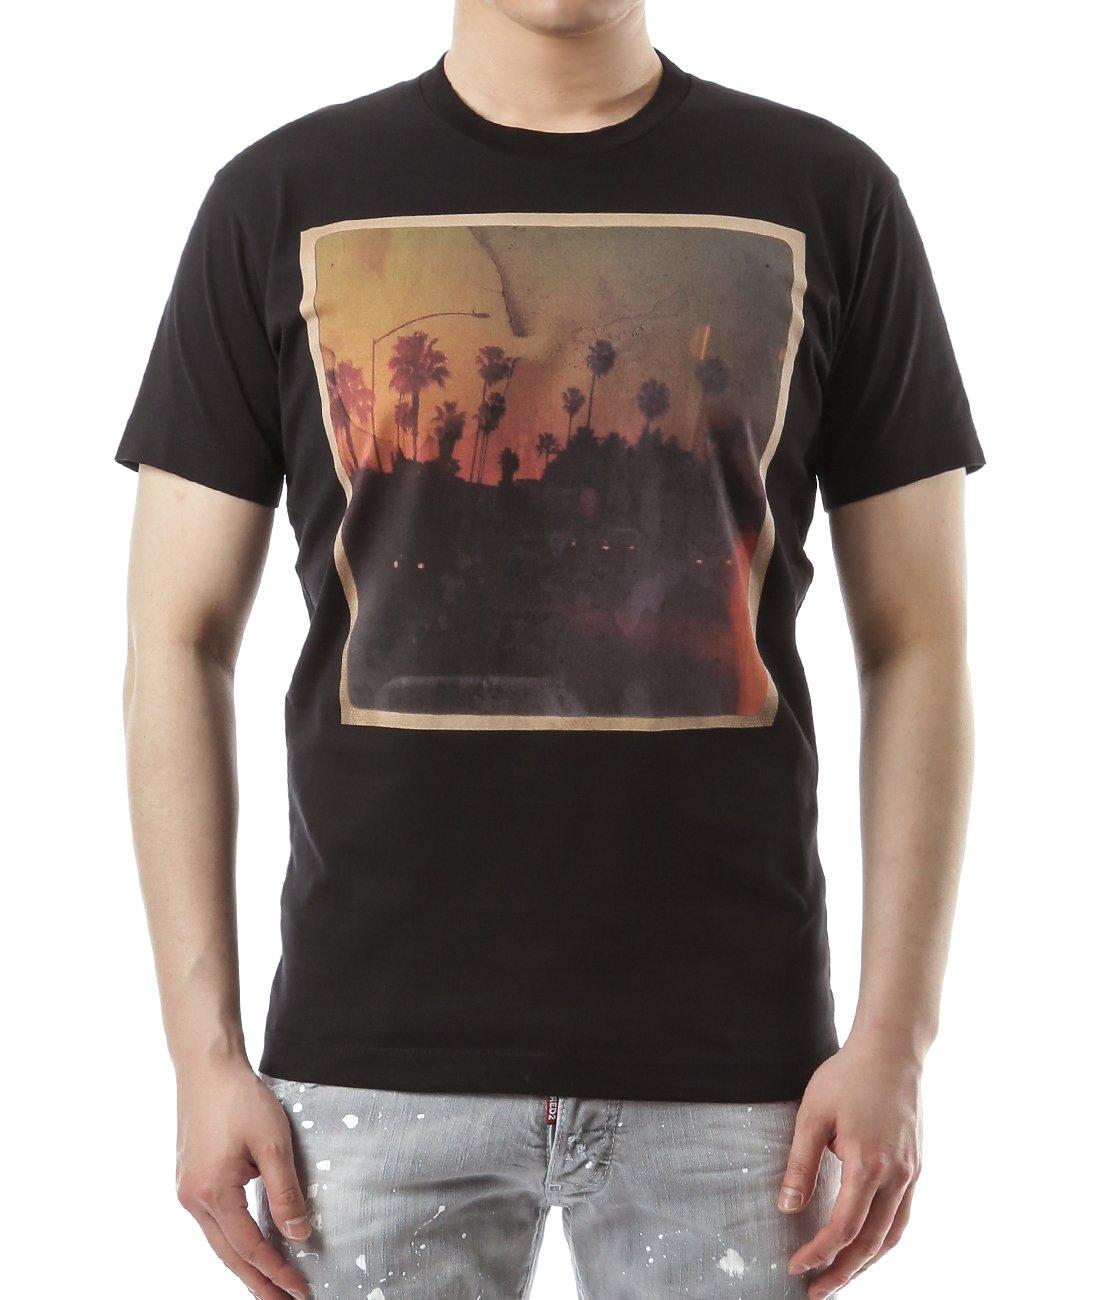 Wiberlux Dsquared2 Men's Vintage Summer Sunset Print T-Shirt S Black